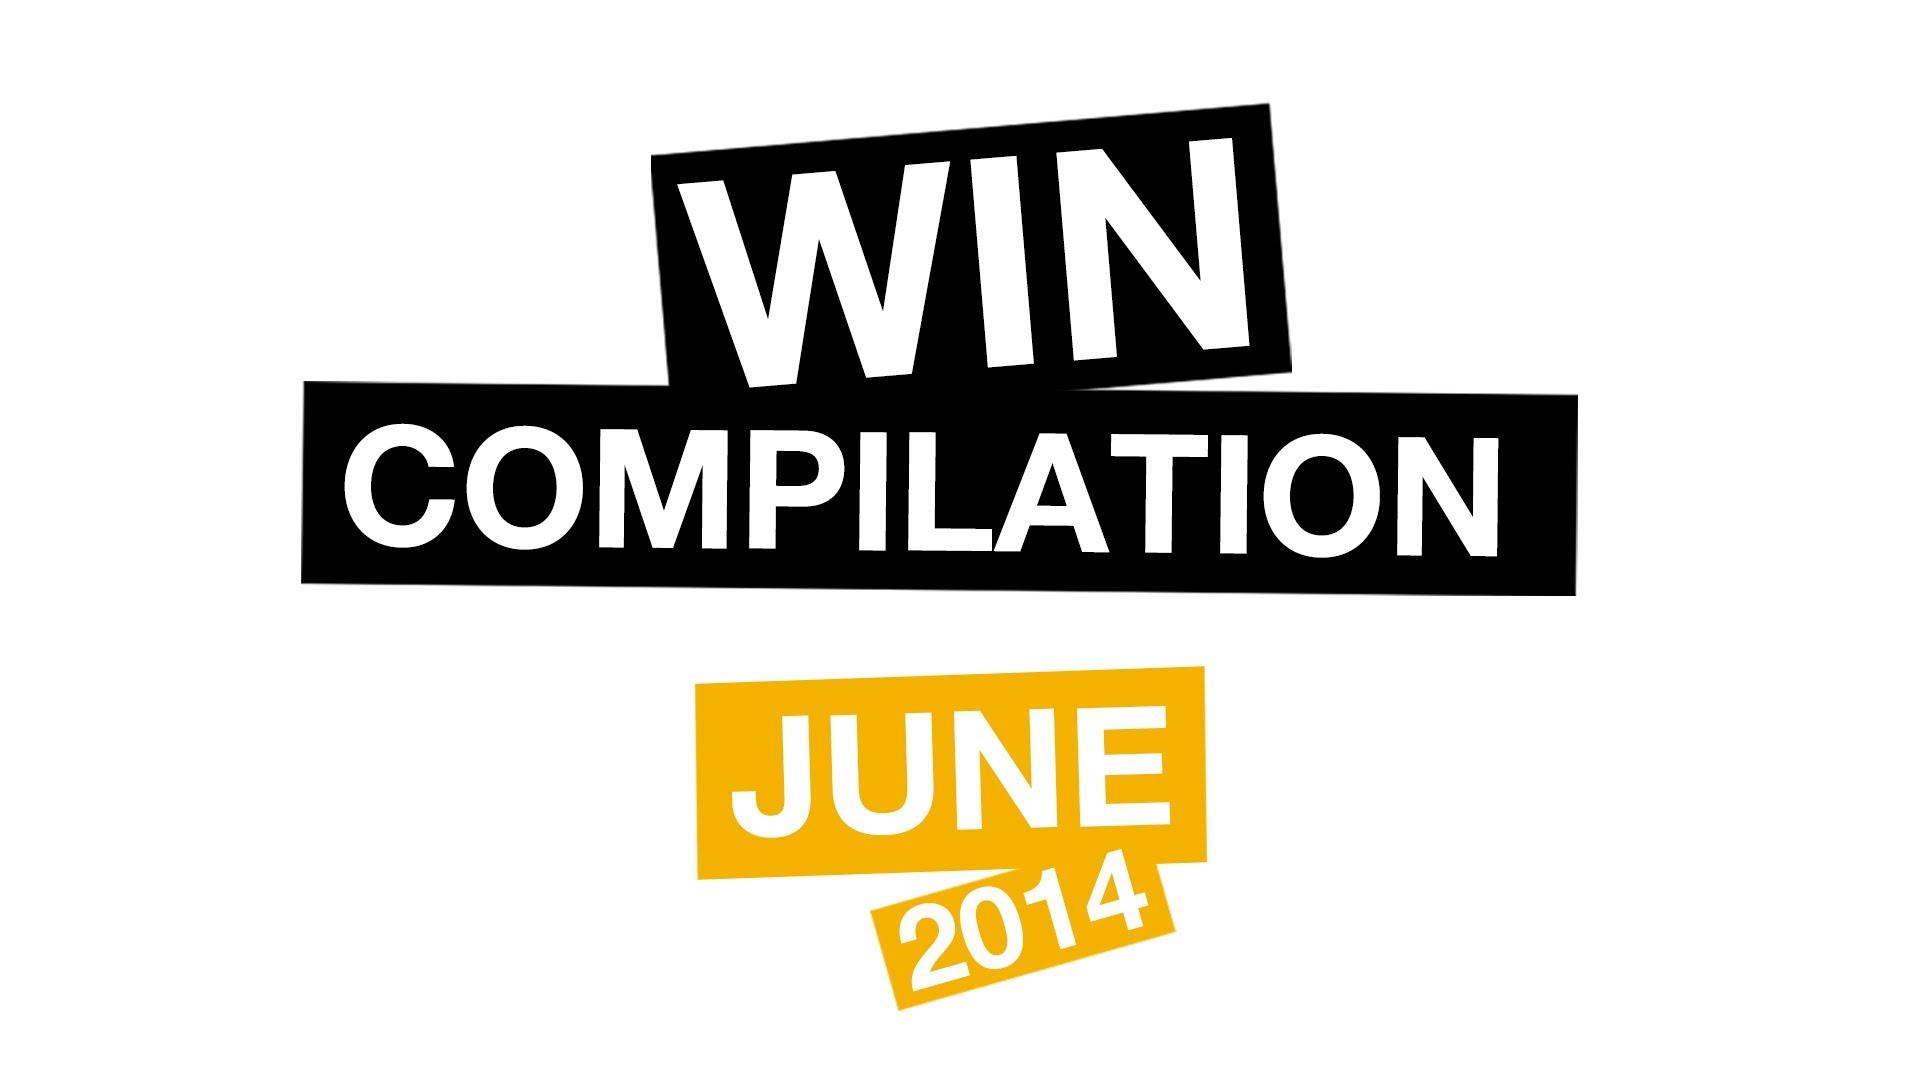 WIN Compilation June 2014